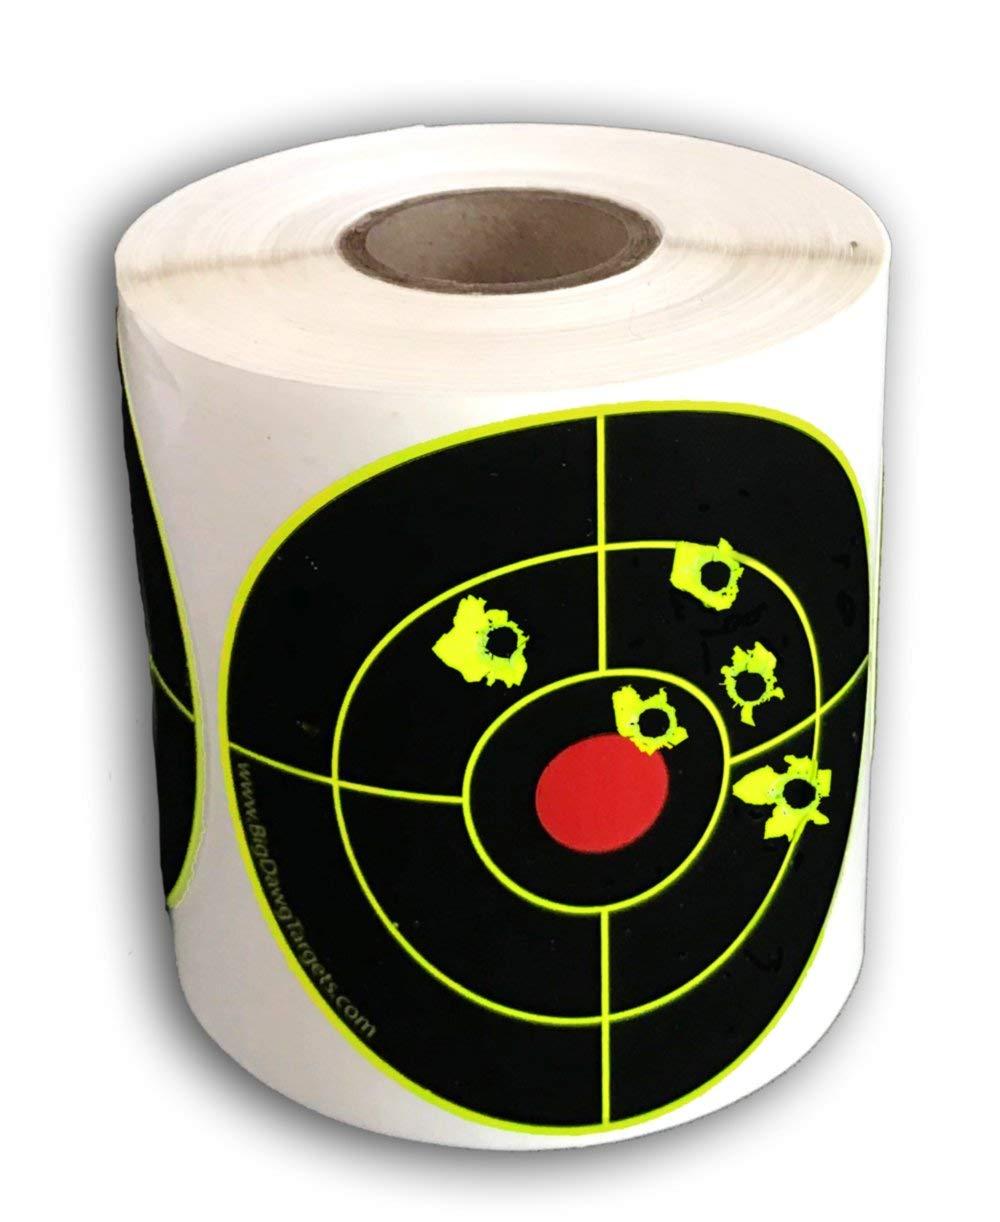 Big Dawg Targets 250 Target Roll - 3'' Inch Adhesive Splatter Target